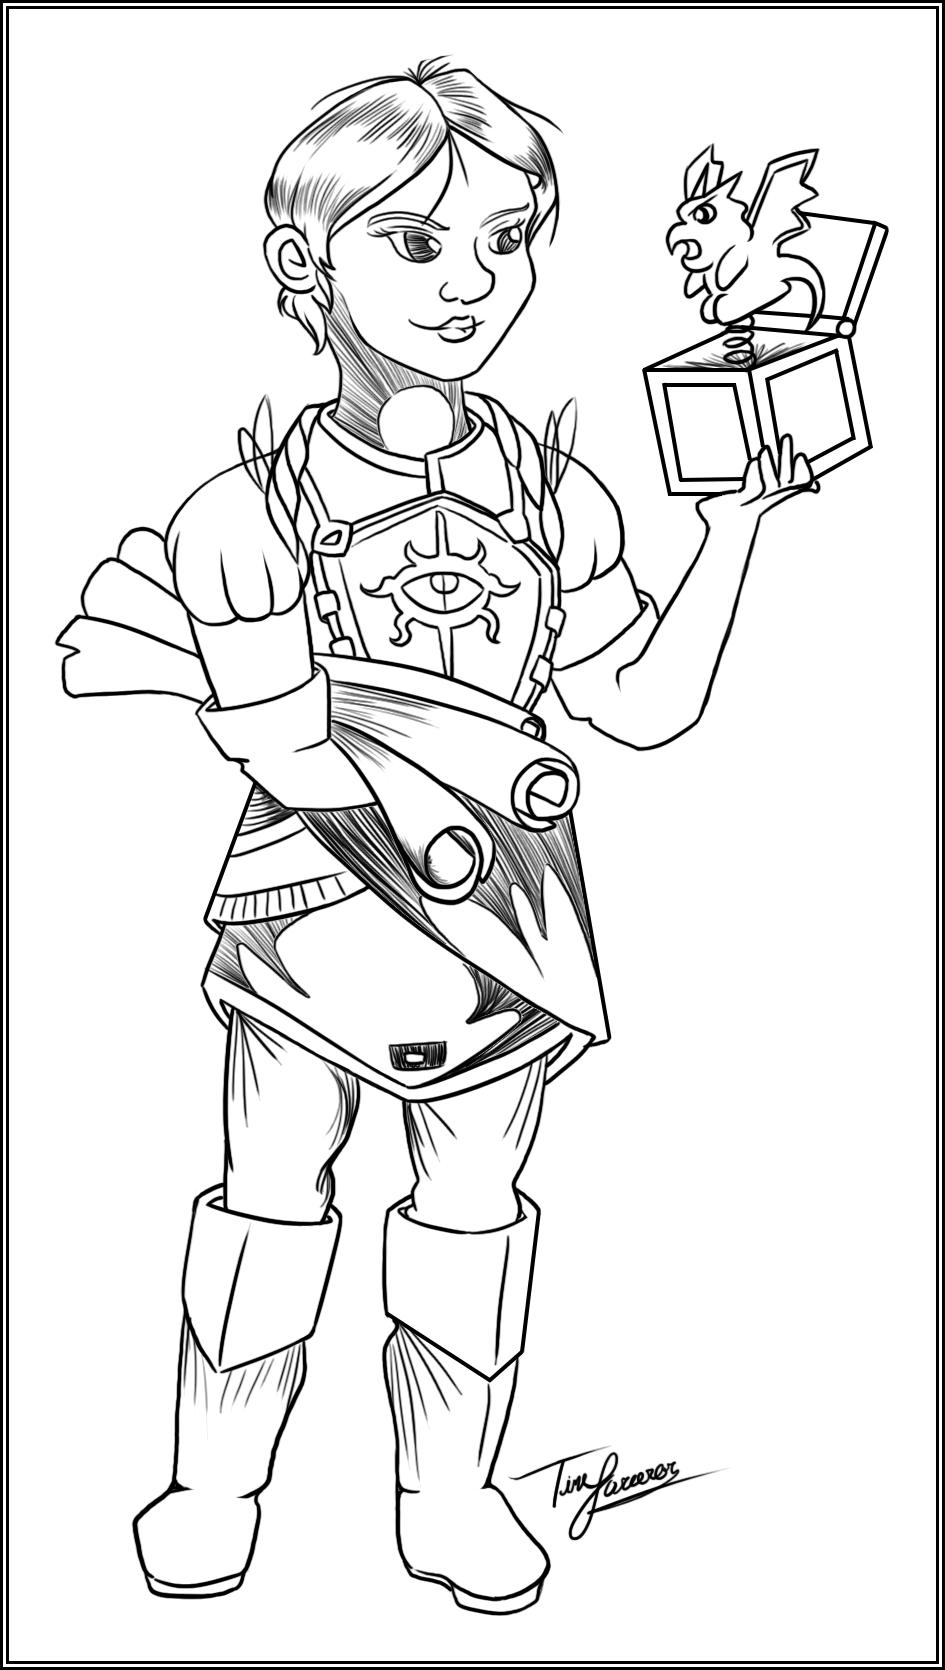 Day 25: Random Dwarf (Dagna)